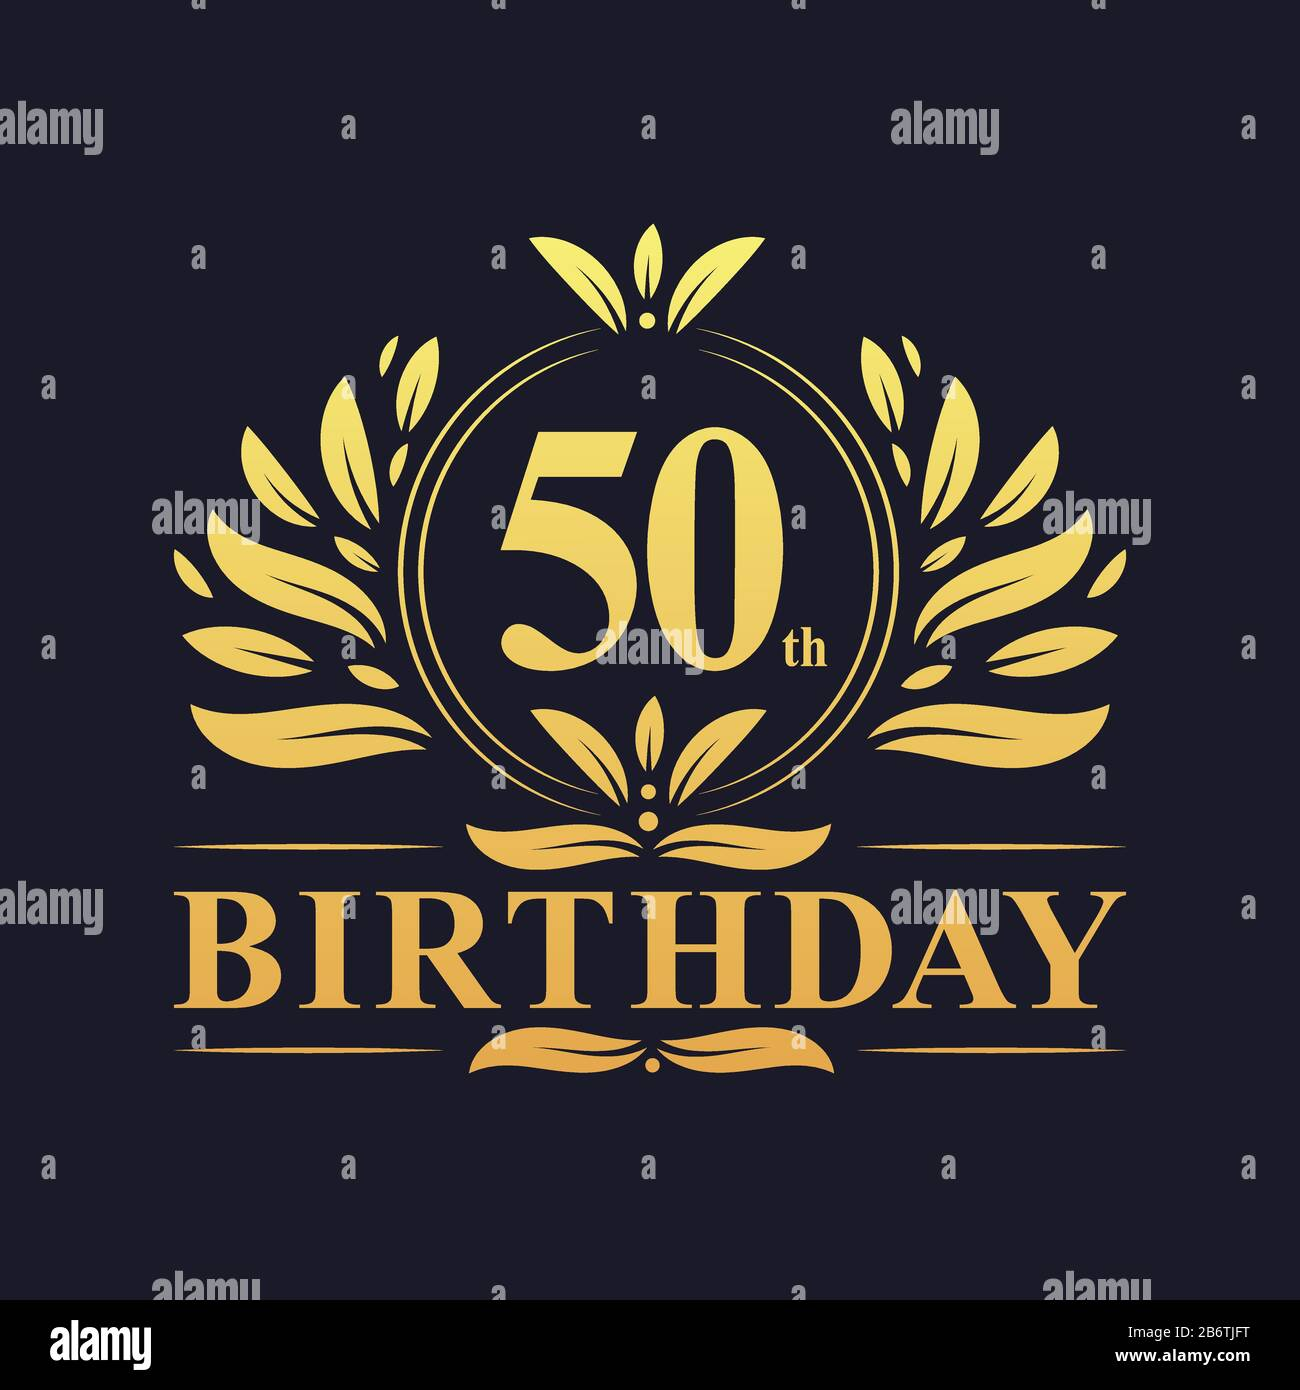 50th Birthday Design Luxurious Golden Color 50 Years Birthday Celebration Stock Vector Image Art Alamy